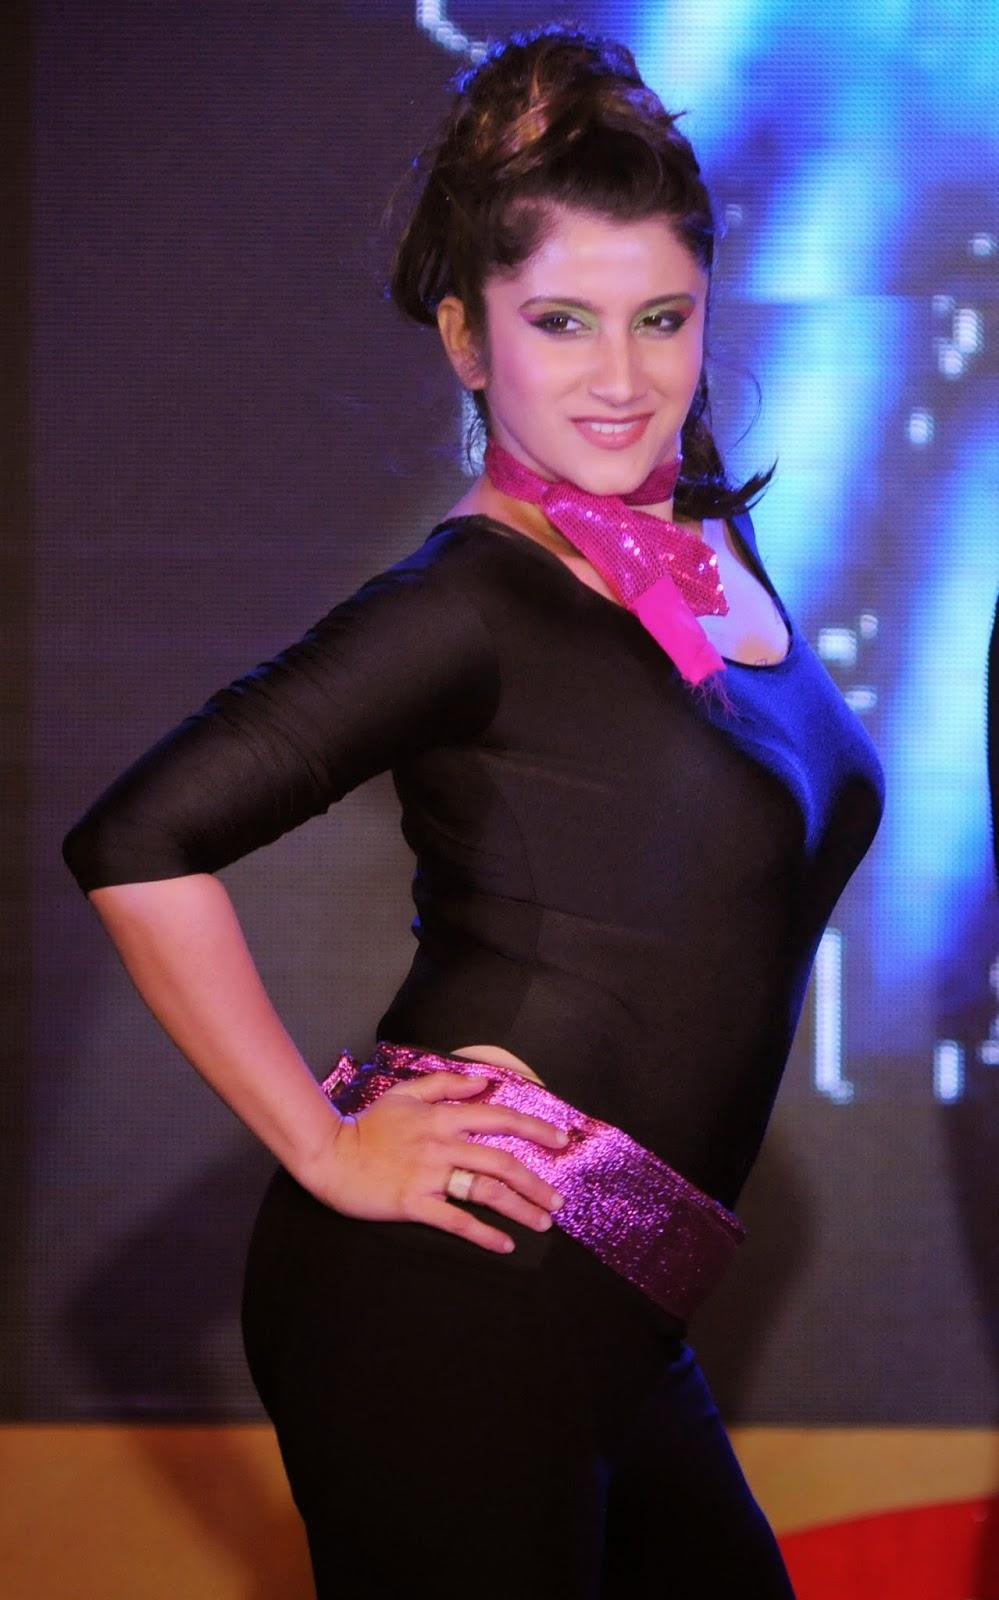 vineet bangera  founder dance central  with smiley suri